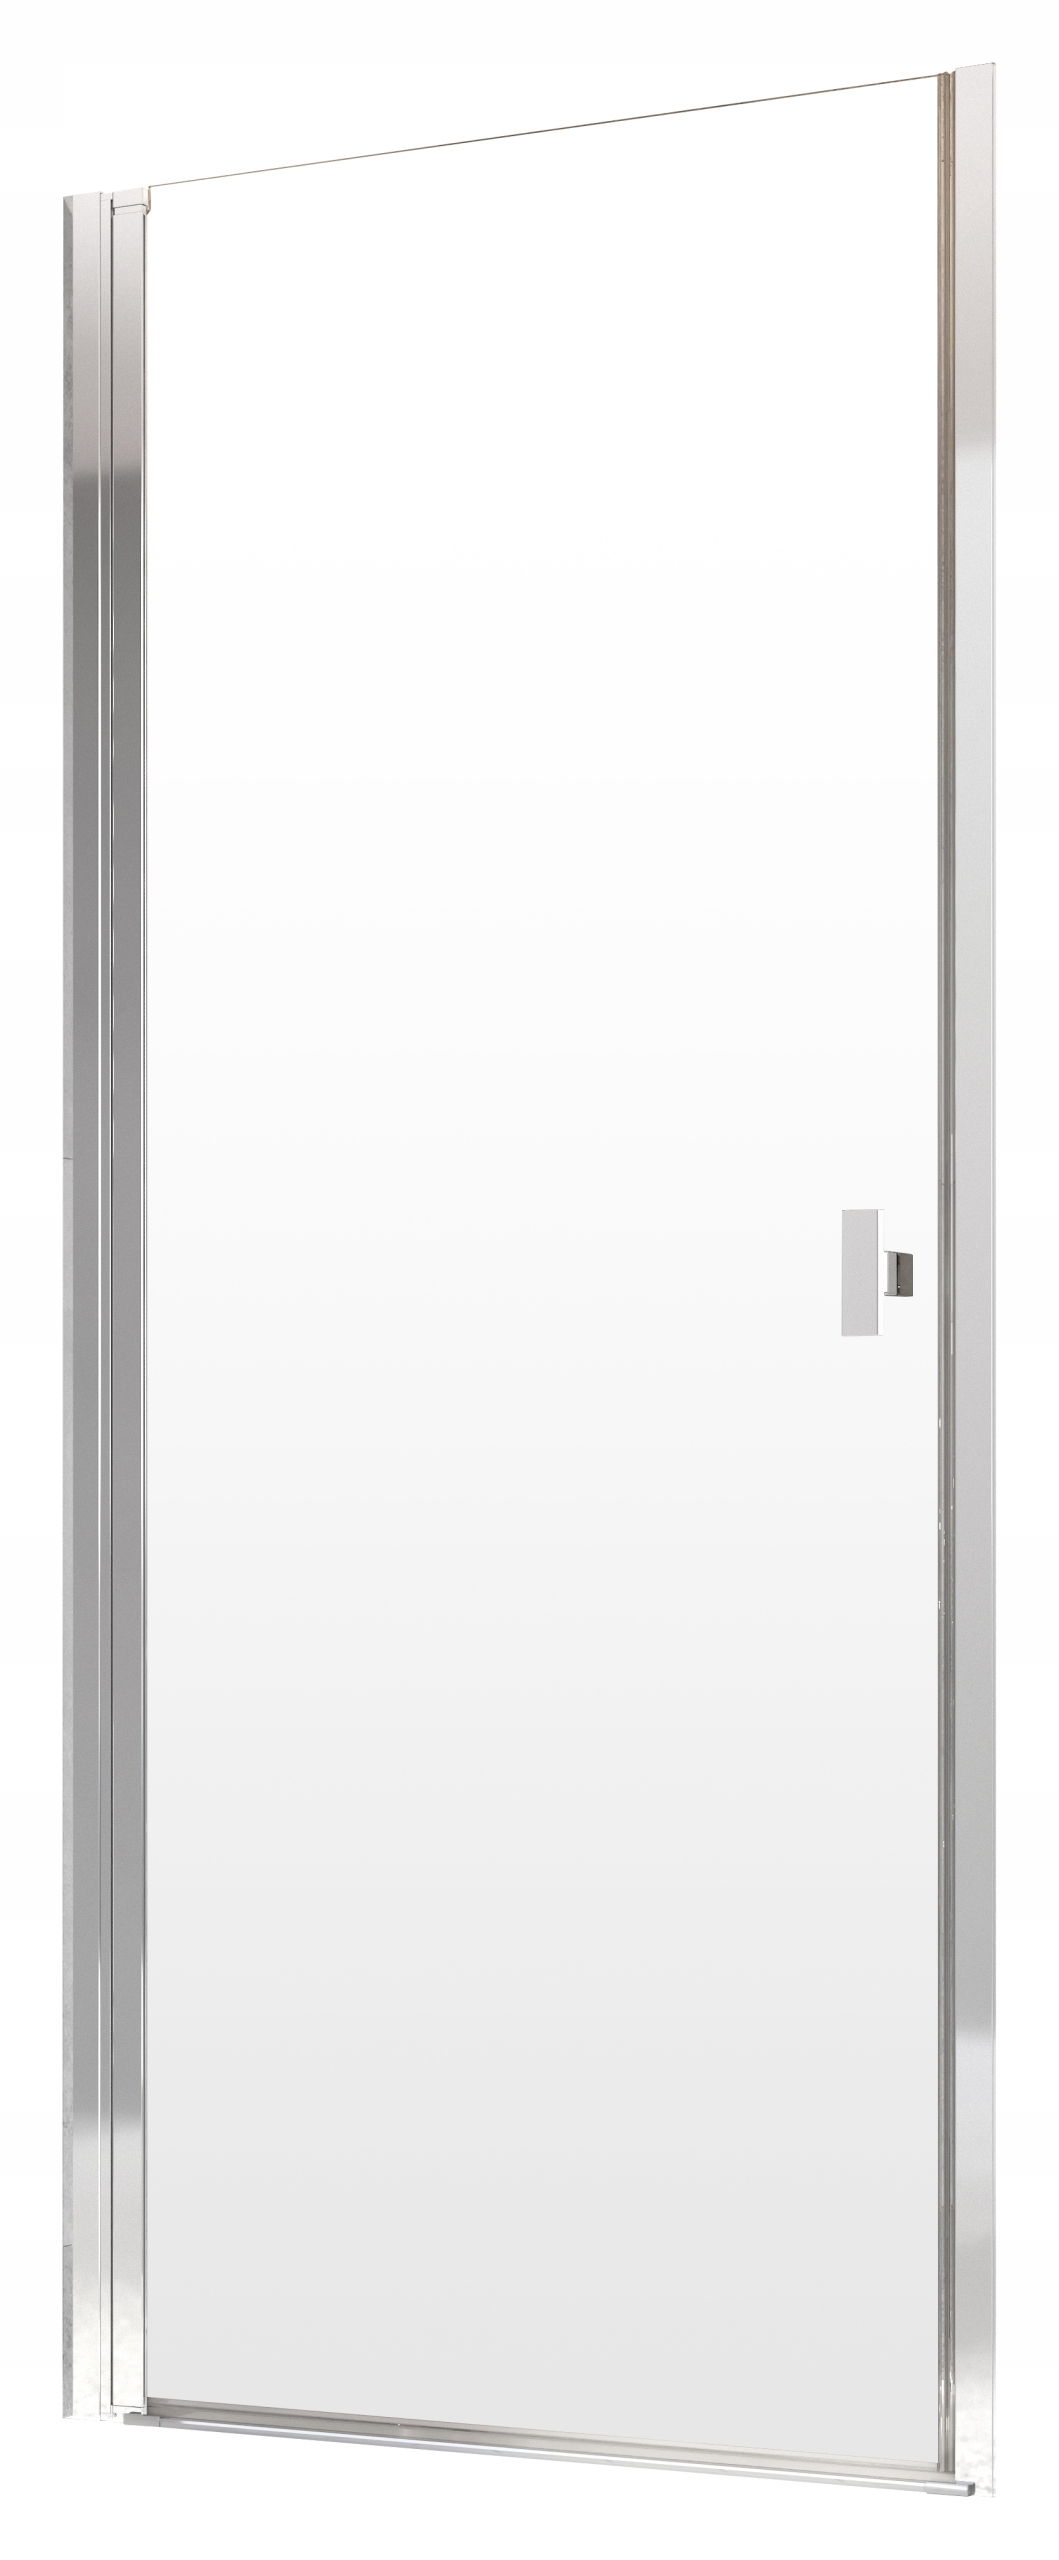 Nes DWJ I 80x200 RADAWAY sprchové dvere